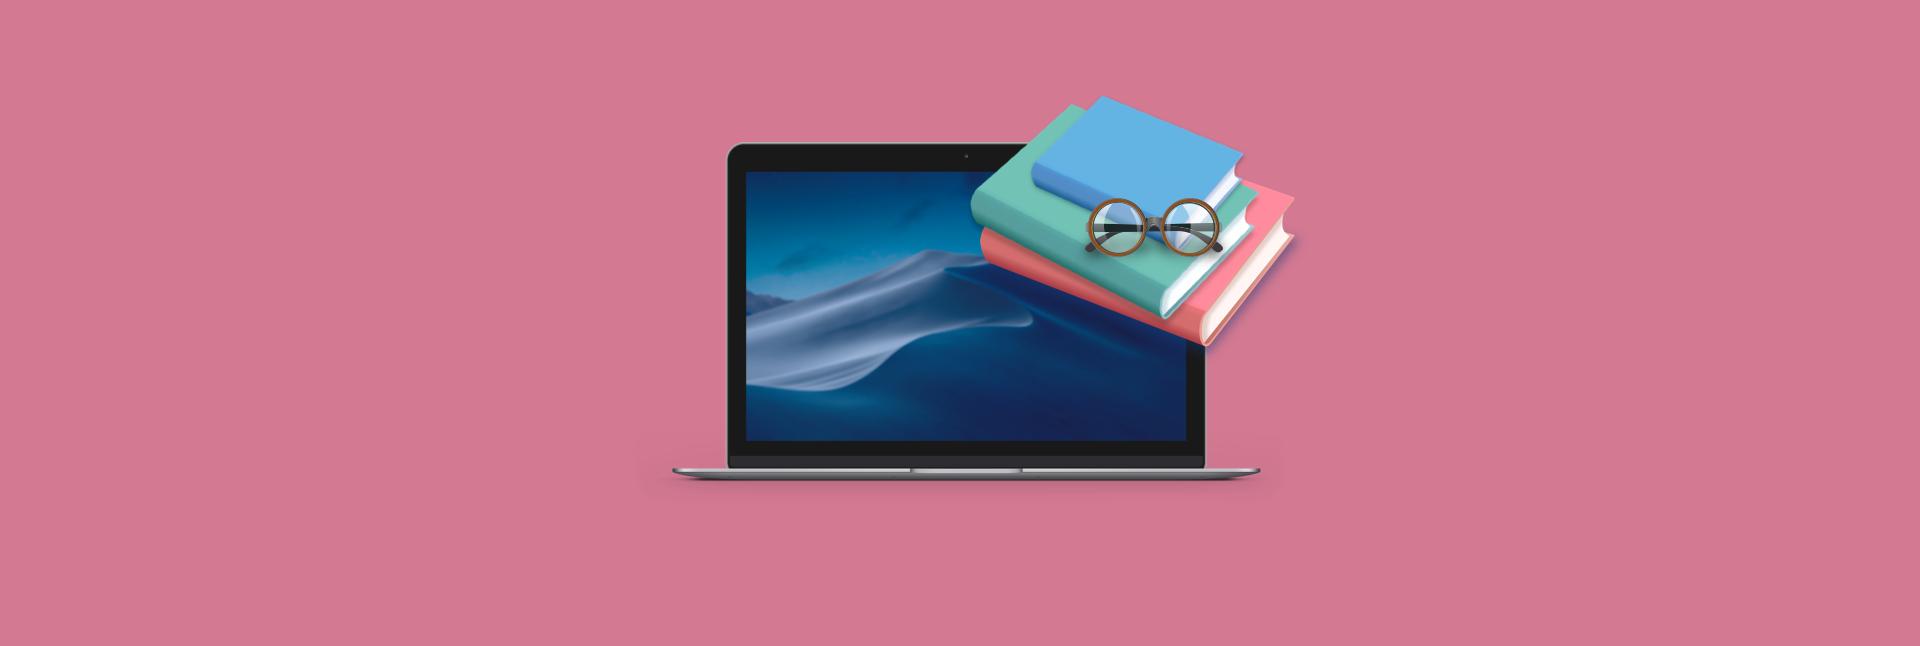 Three Best Apps For Reading Books On Mac – Setapp